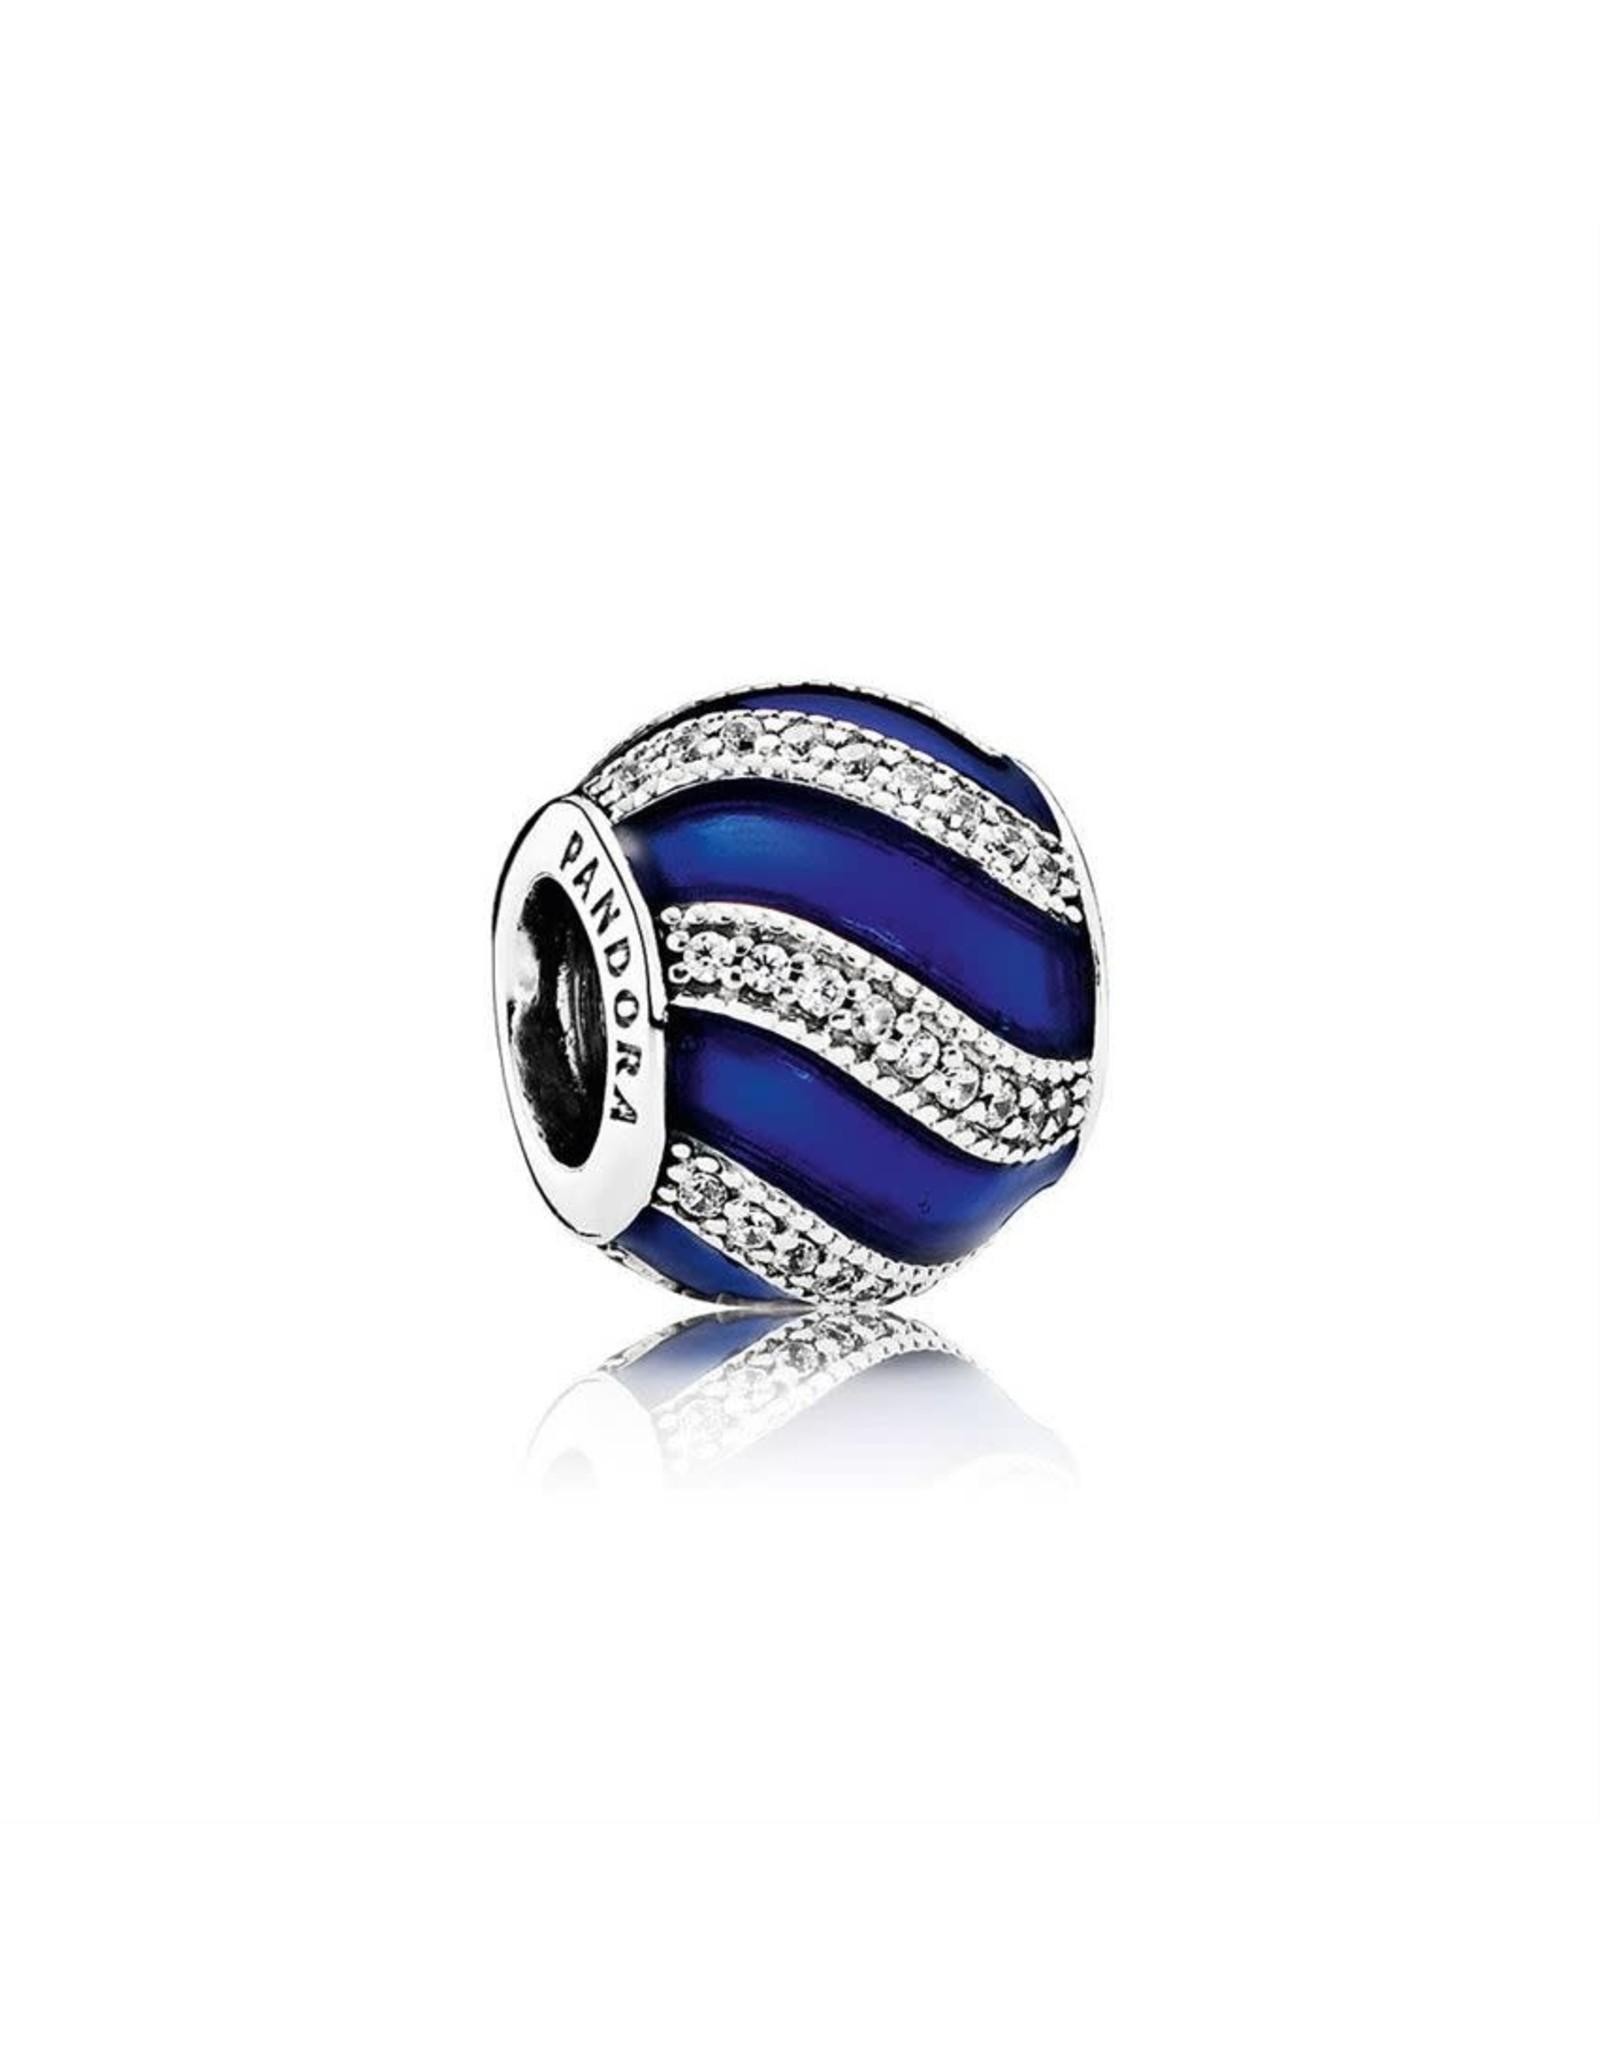 Pandora Pandora Charm Adornment, Transparent Royal Blue Enamel & Clear CZ